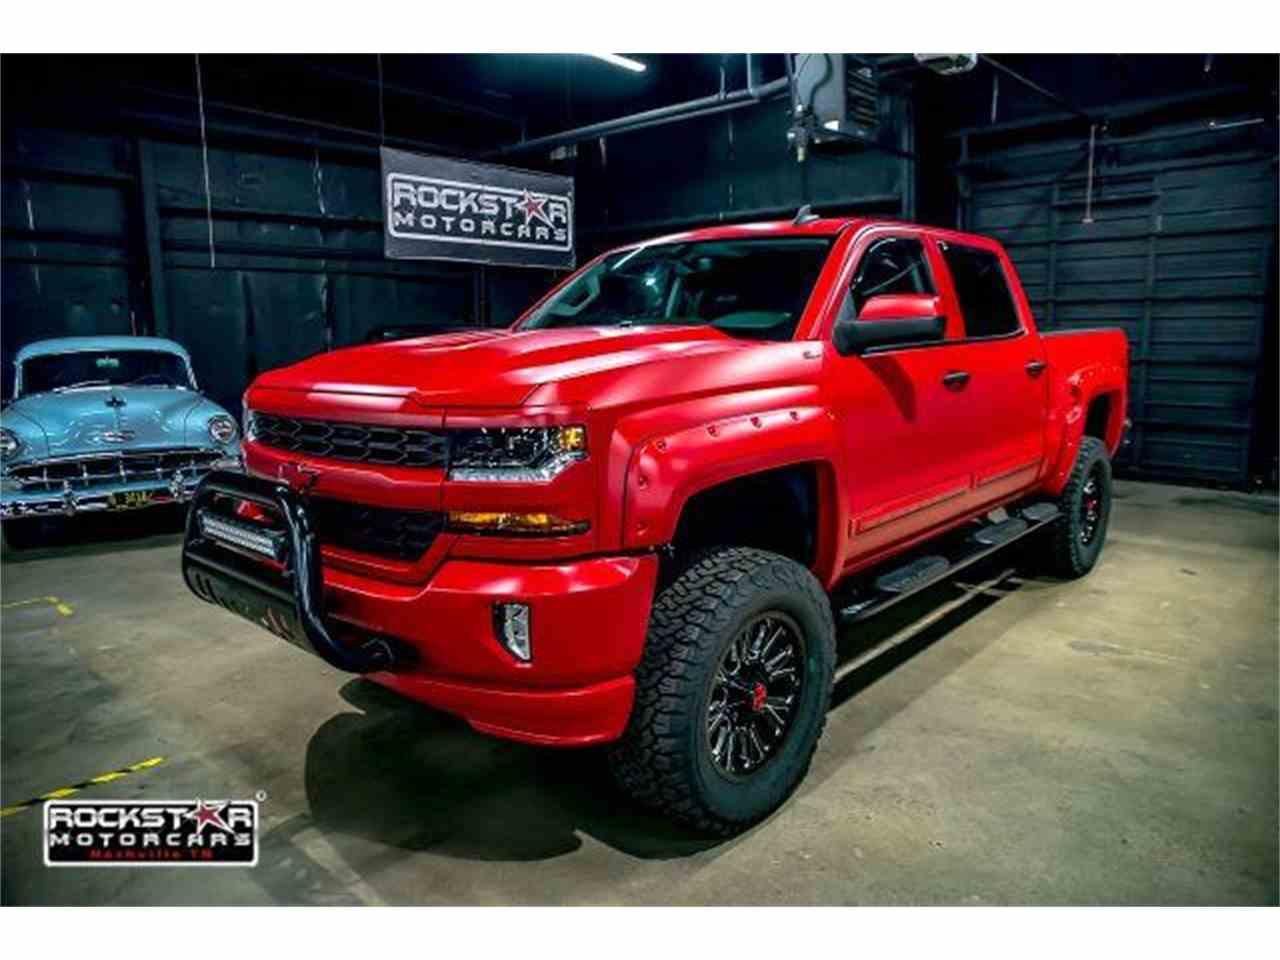 2016 Chevrolet Silverado for Sale - CC-997403